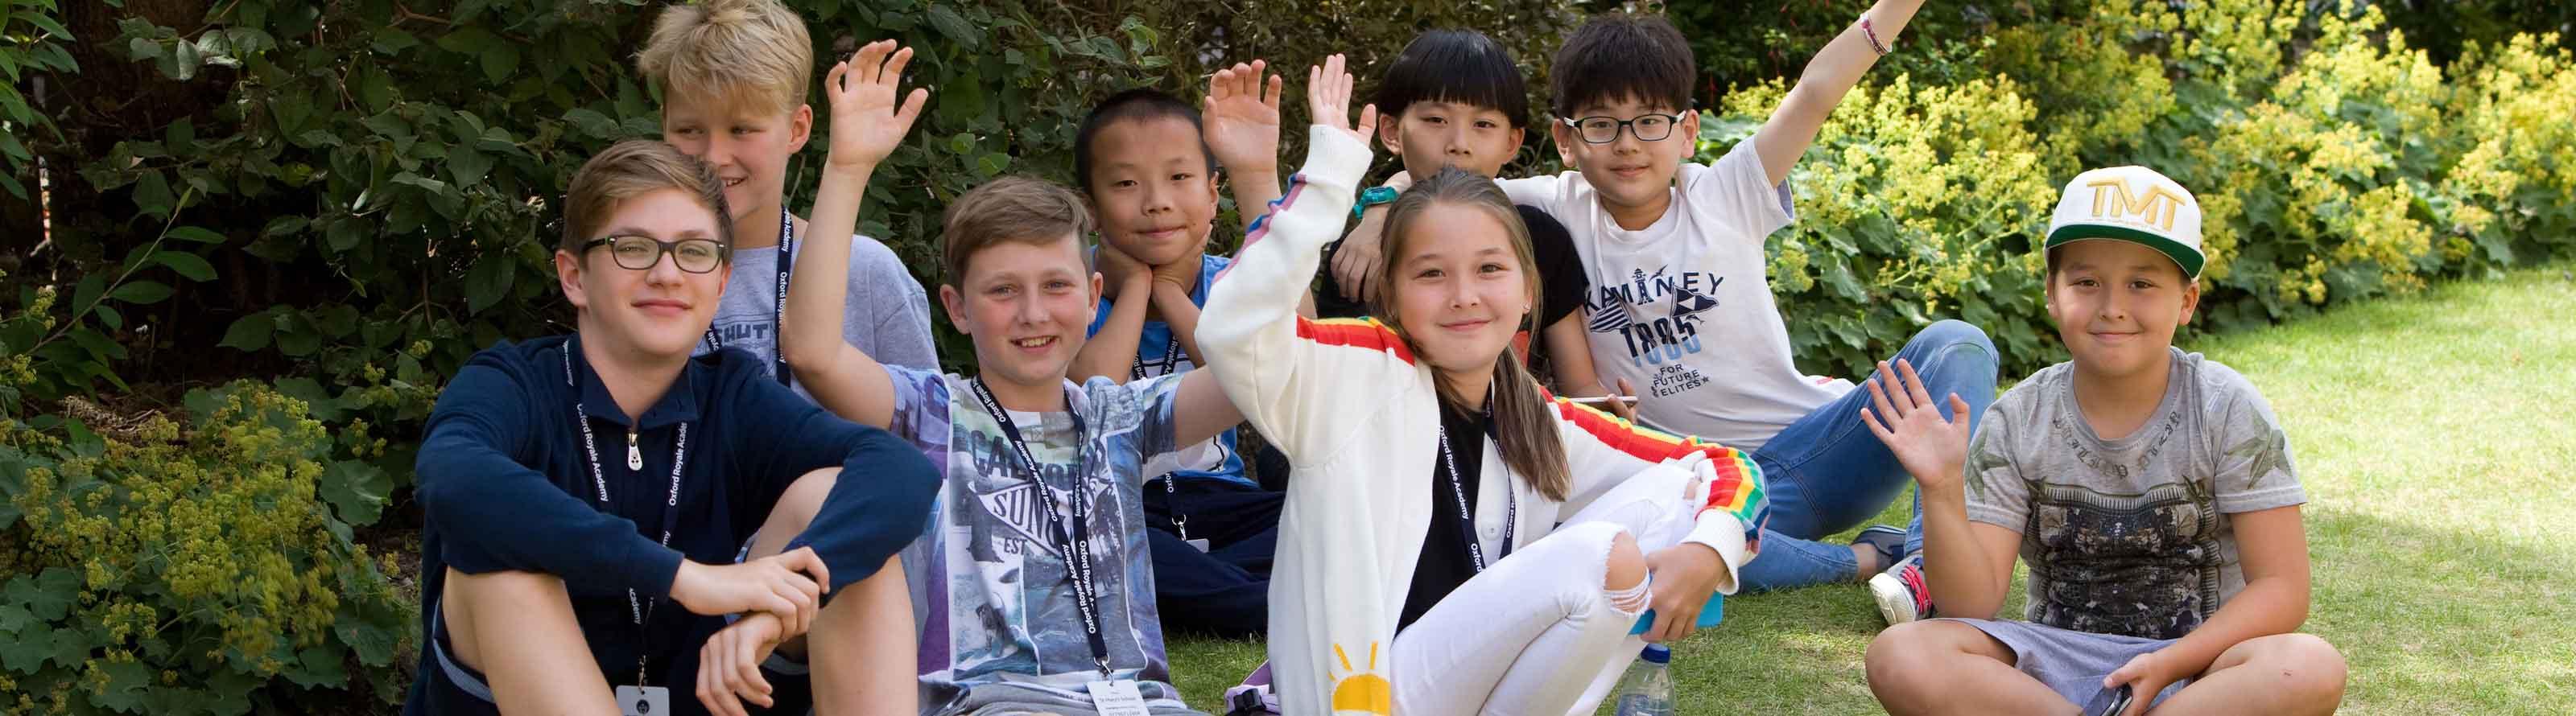 junior-summer-school-banner-3200x890